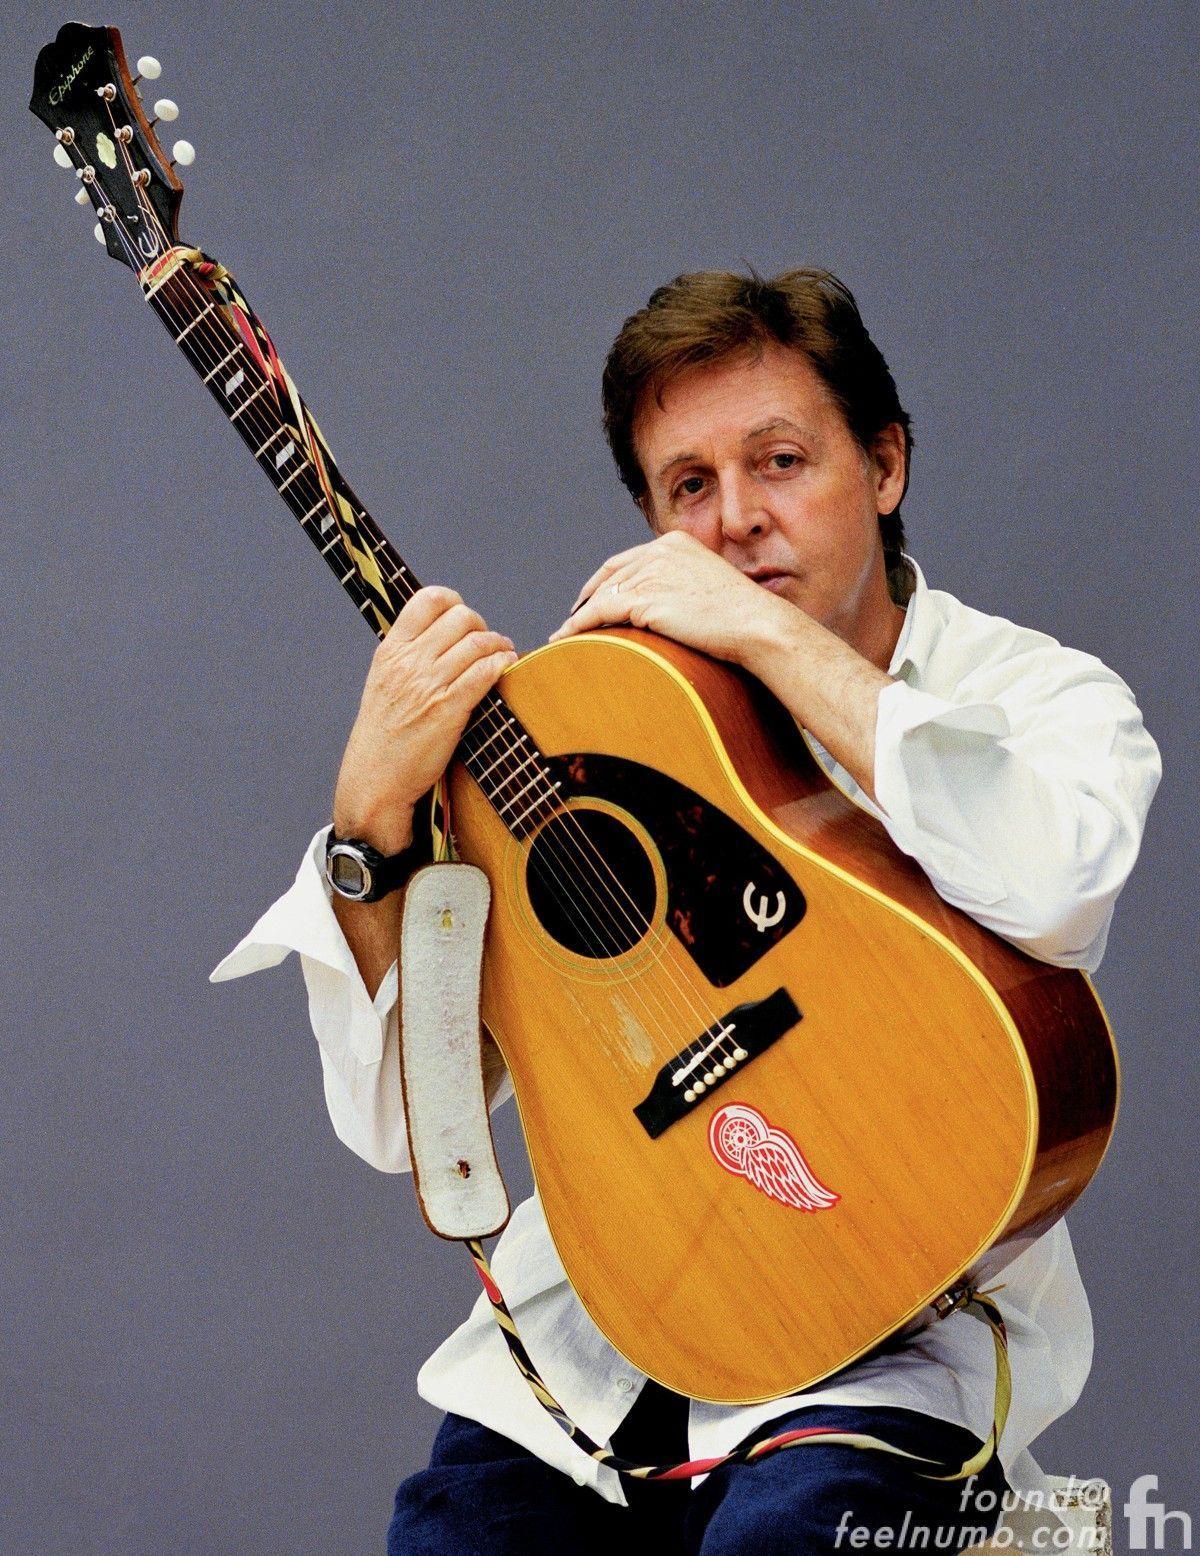 Paul Mccartney Detroit Red Wings Sticker Epiphone Texan Acoustic Epi Vs Gibson Selector Switch Mylespaulcom Guitar